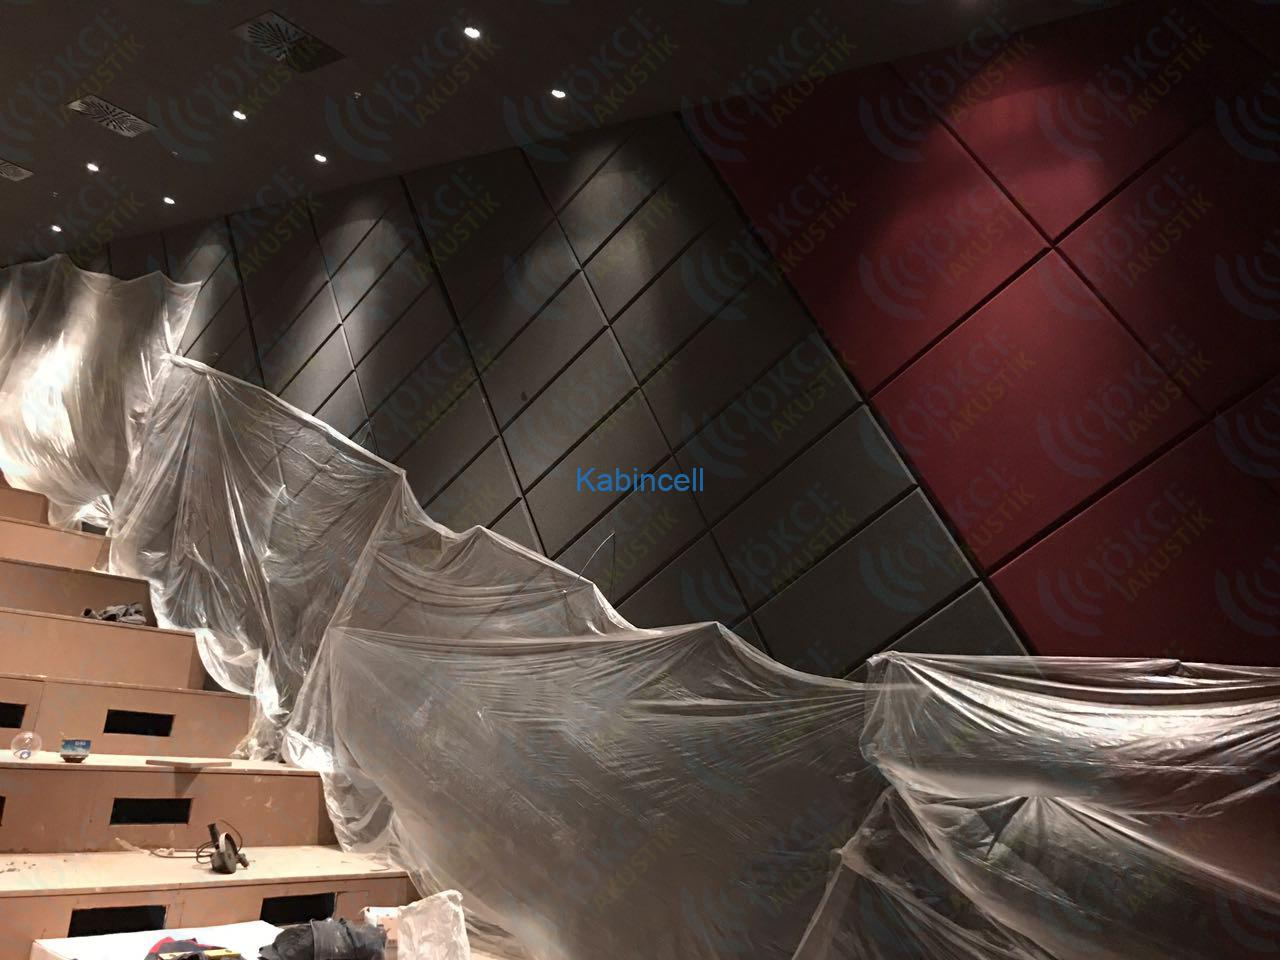 sinema-salonu-akustik-panel-kaplama-kumas-kapli-panel-parmephon06